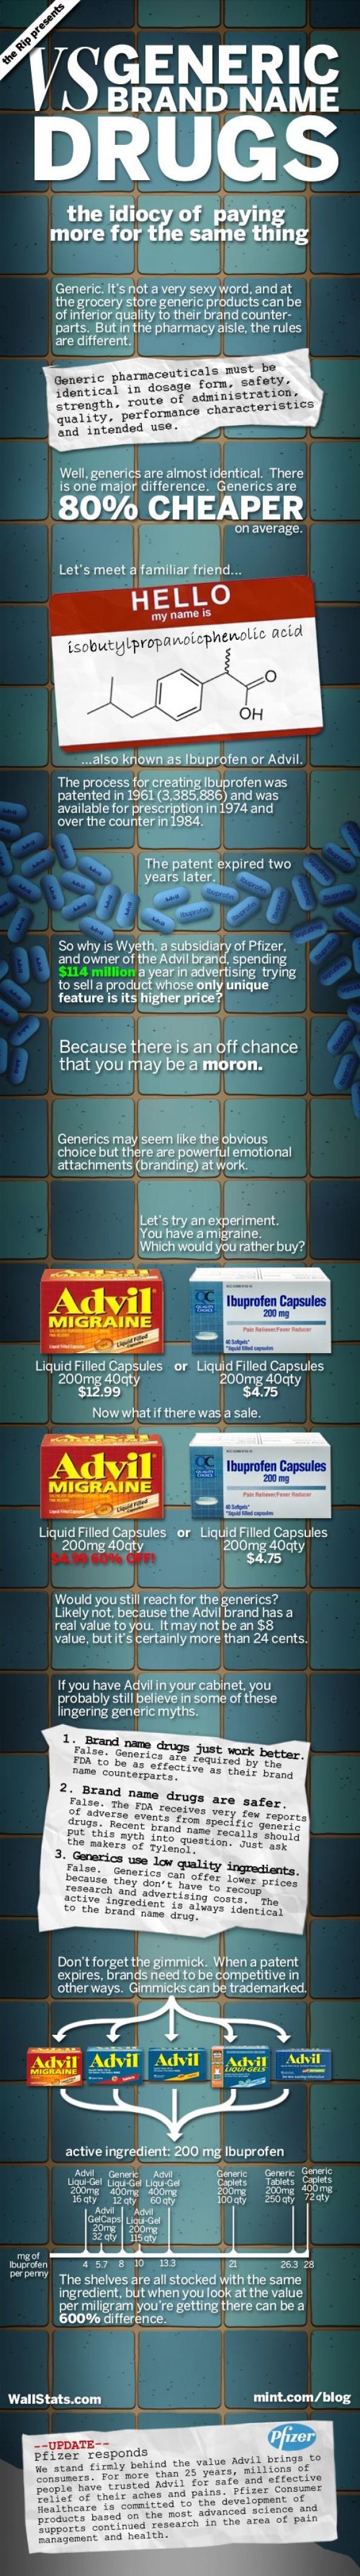 Generic vs Brand Name Drugs Infographic 8